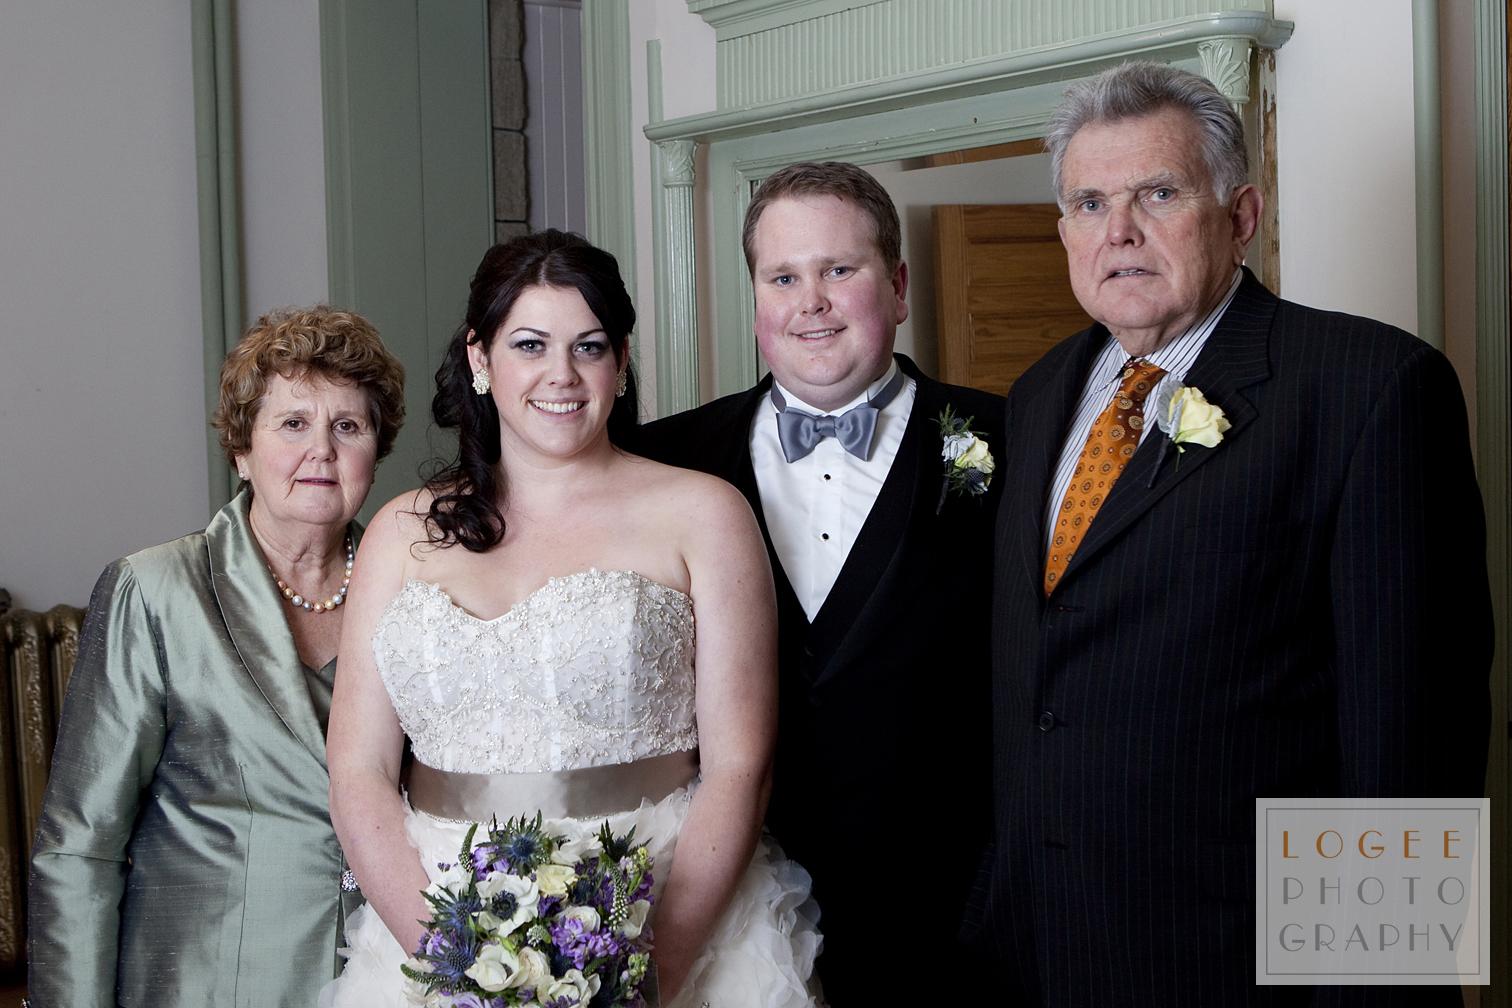 McIntosh-Burns Wedding - 7004Aw